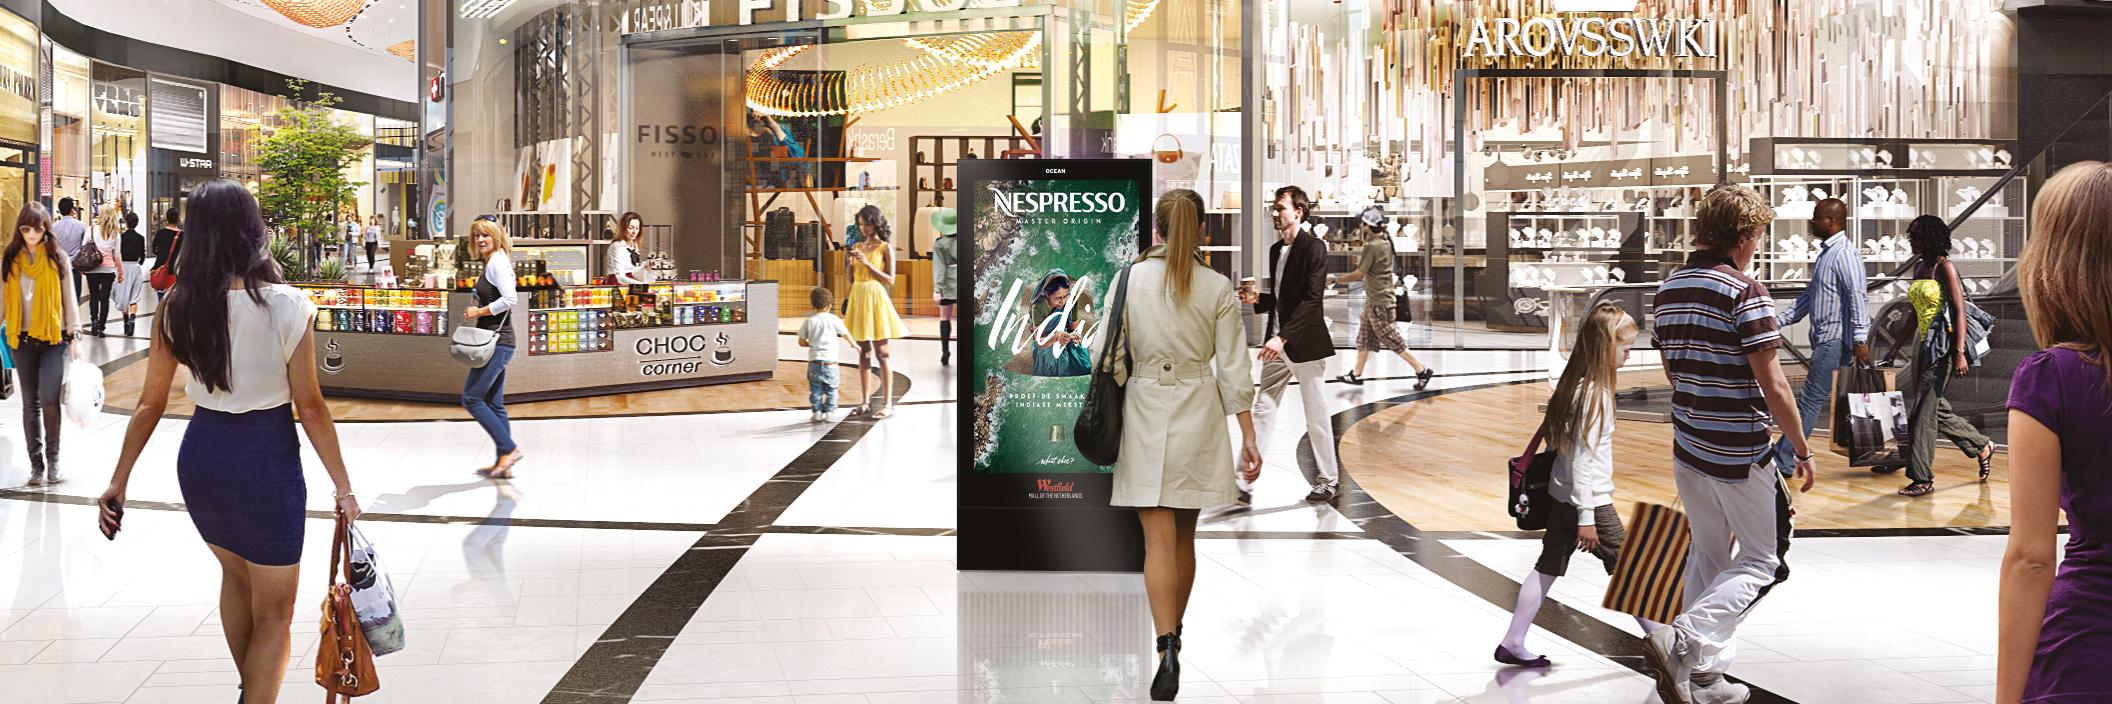 Nieuwe schermen Westfield Mall of the Netherlands